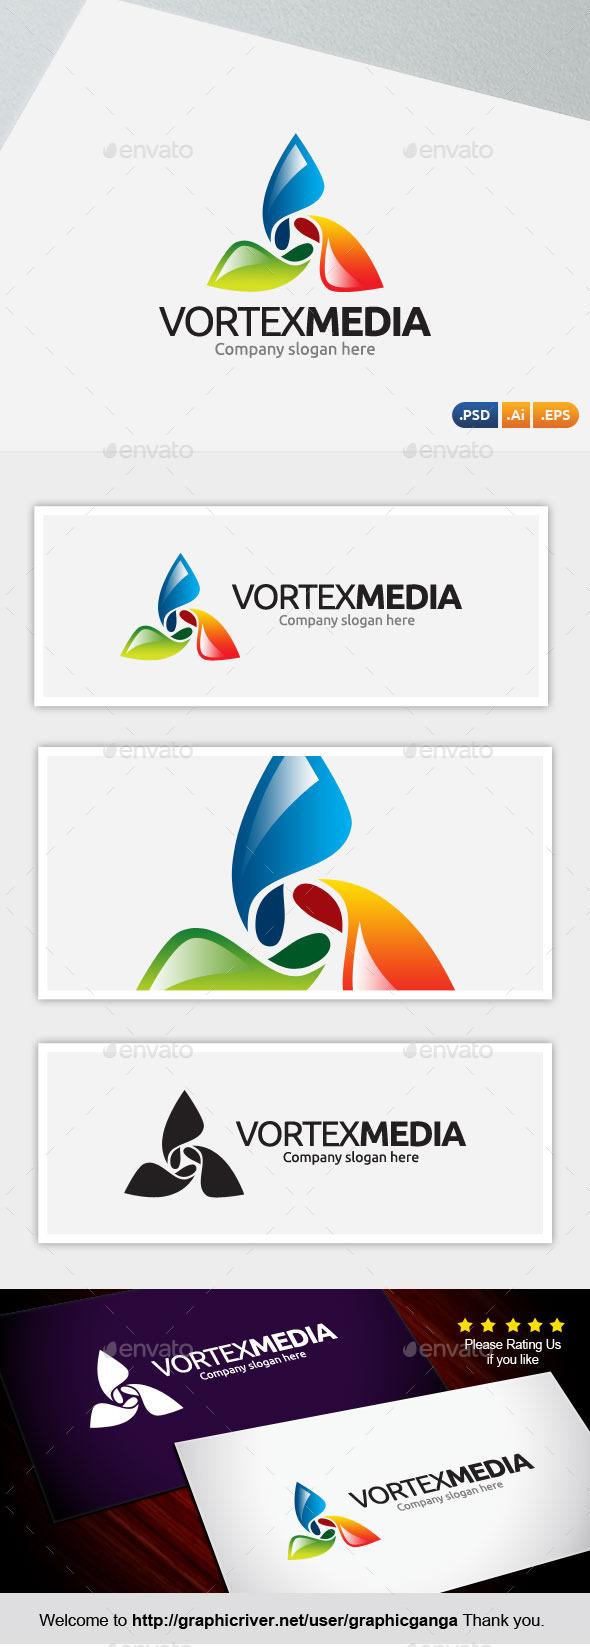 Vortex Media - Abstract Logo Templates